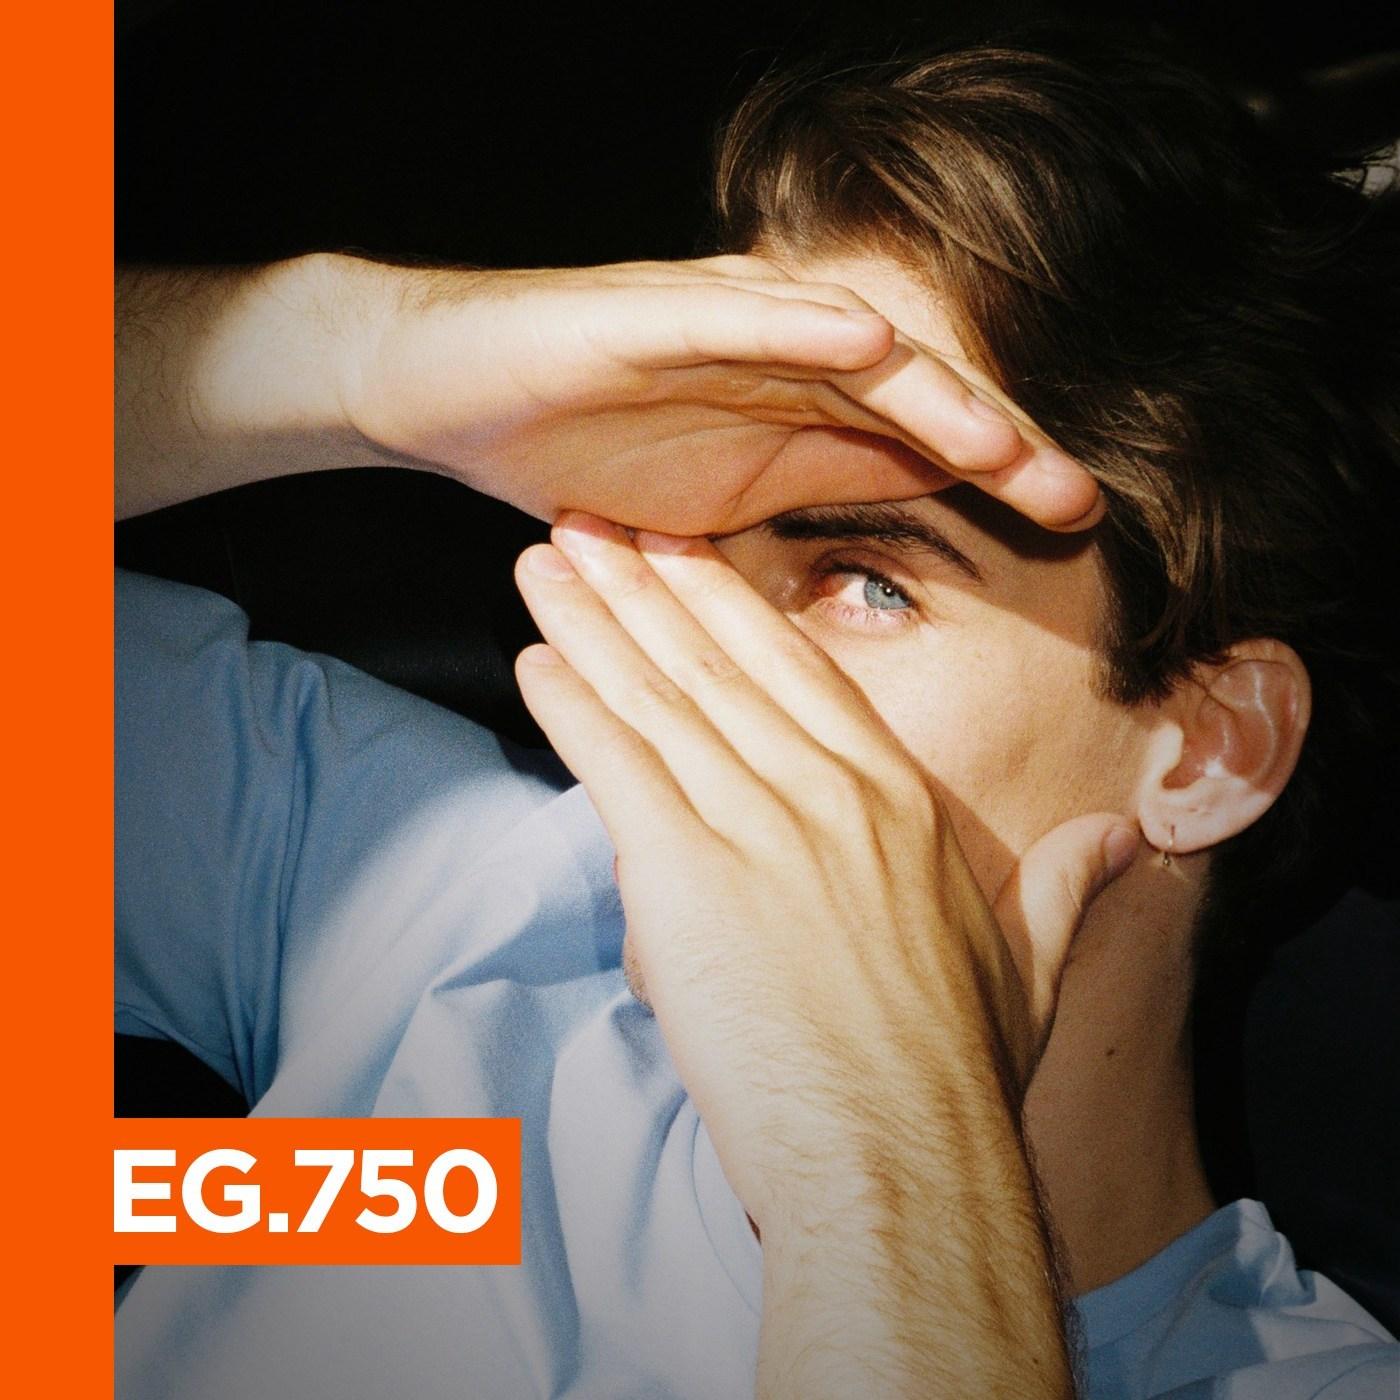 eg750-tibi-dabo